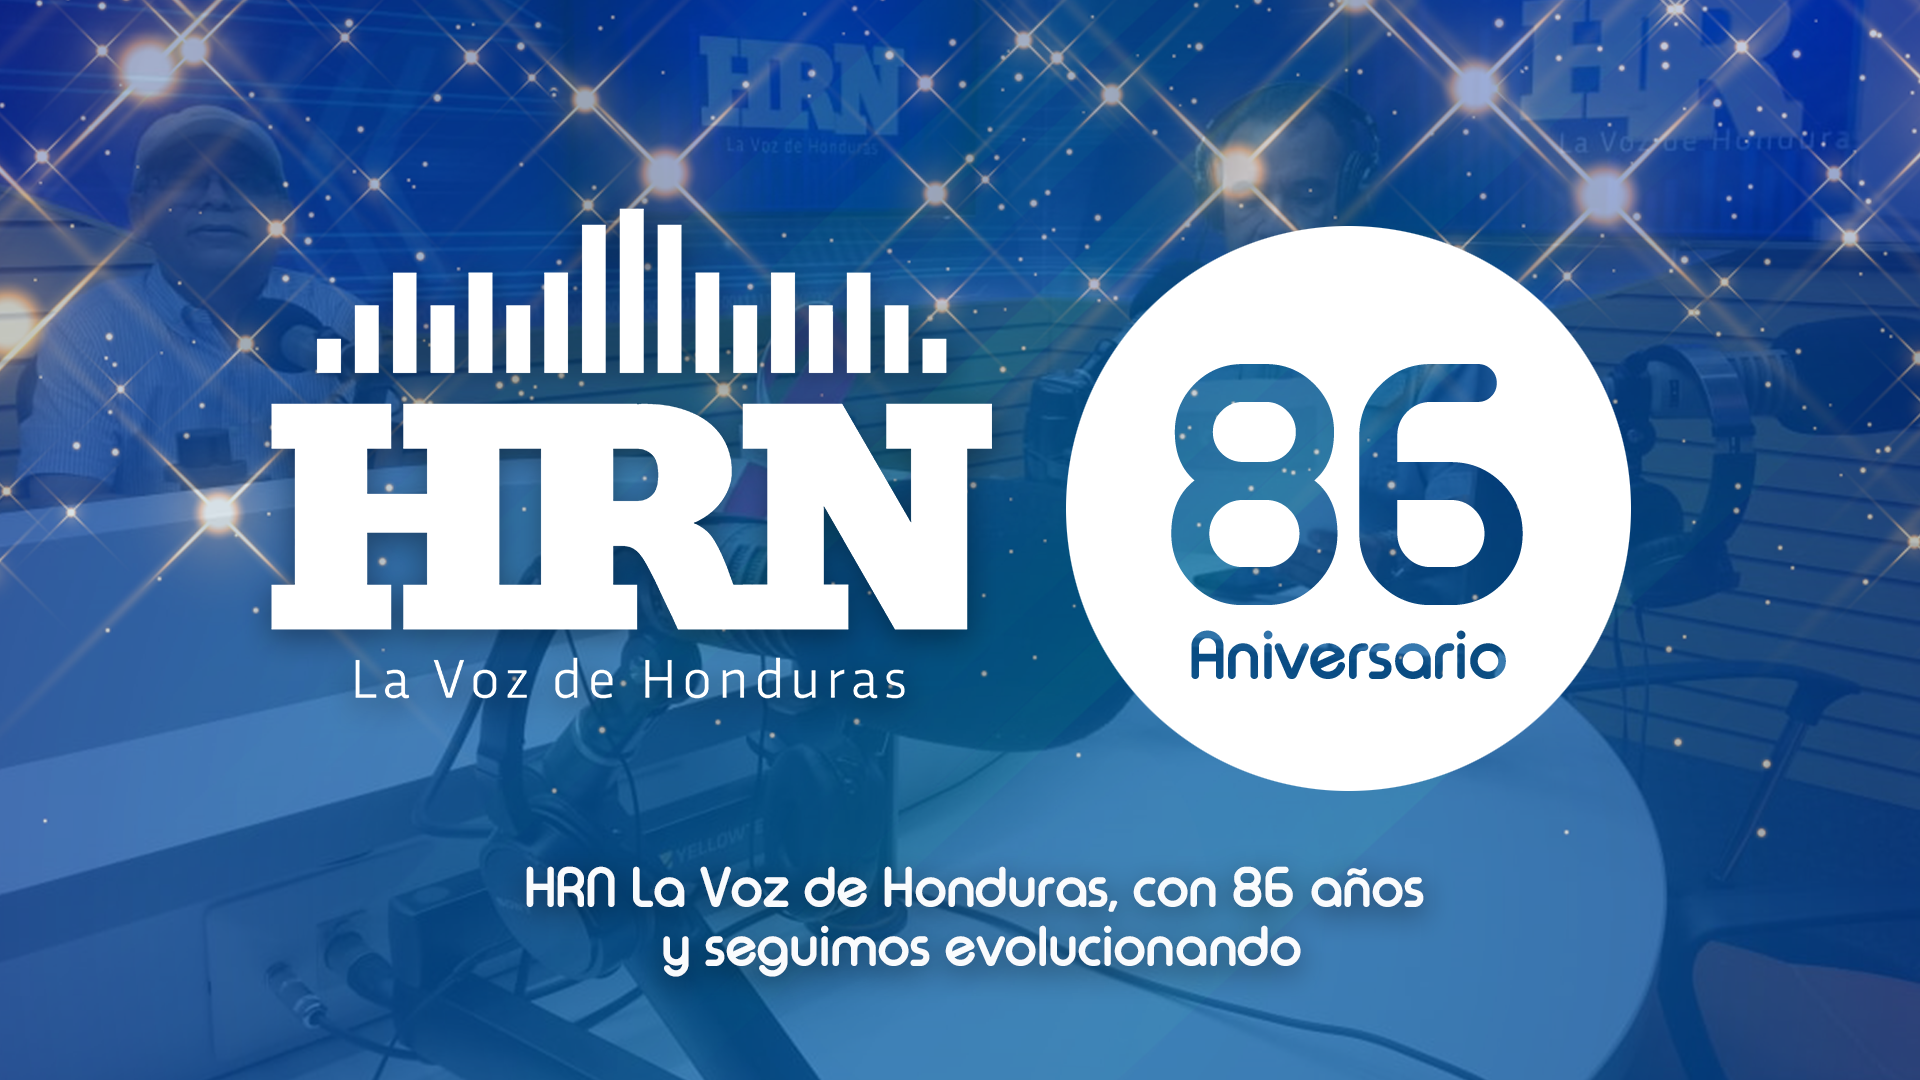 HRN celebra 86 años de informar a Honduras